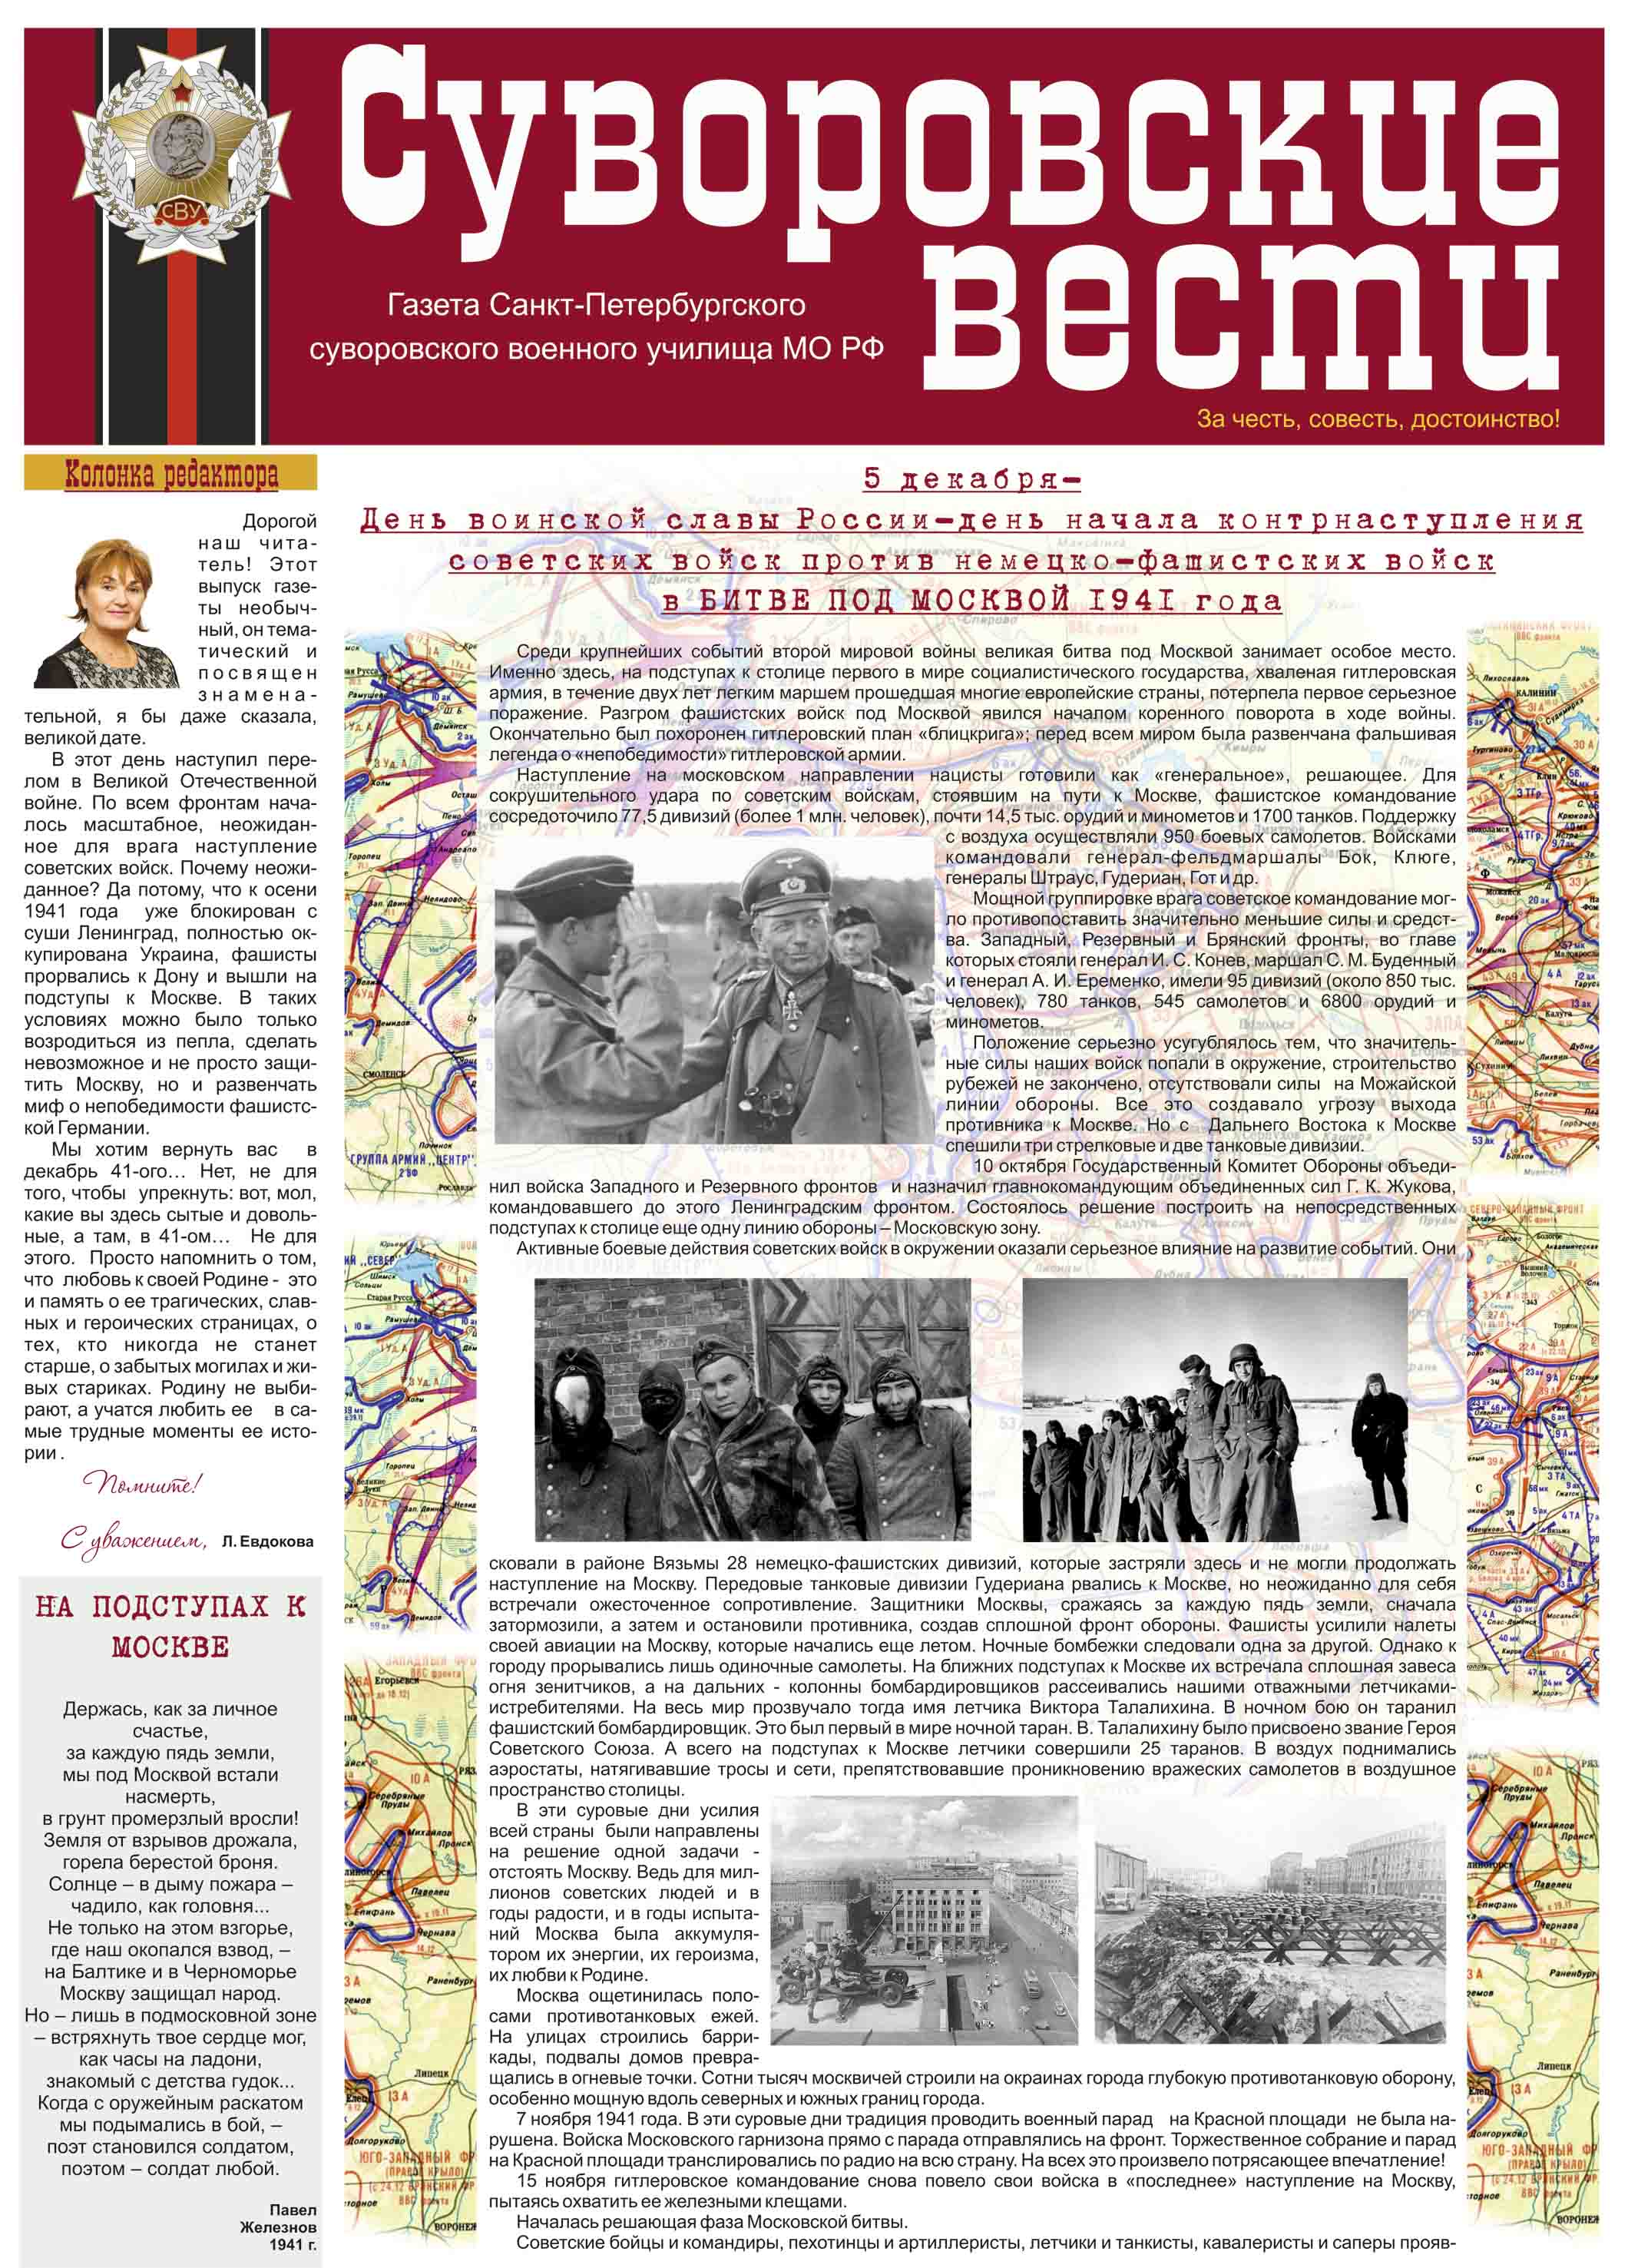 newsPaper_12.cdr